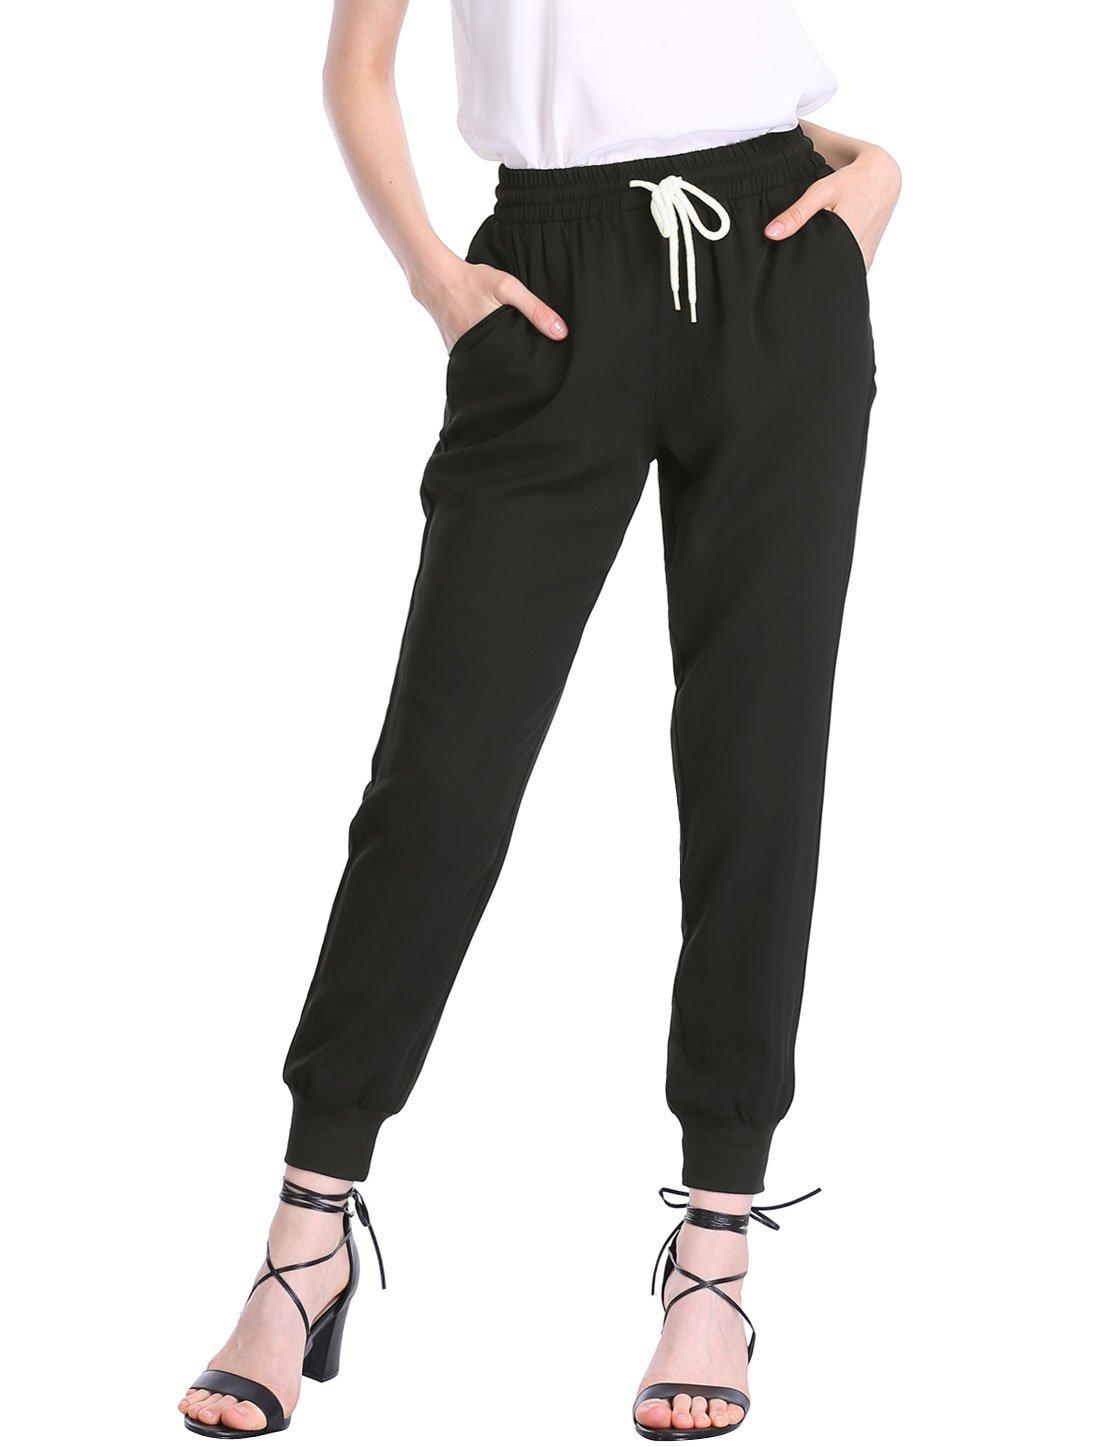 Allegra K Women's Drawstring Elastic Waist Cropped Jogger Pants Black XS